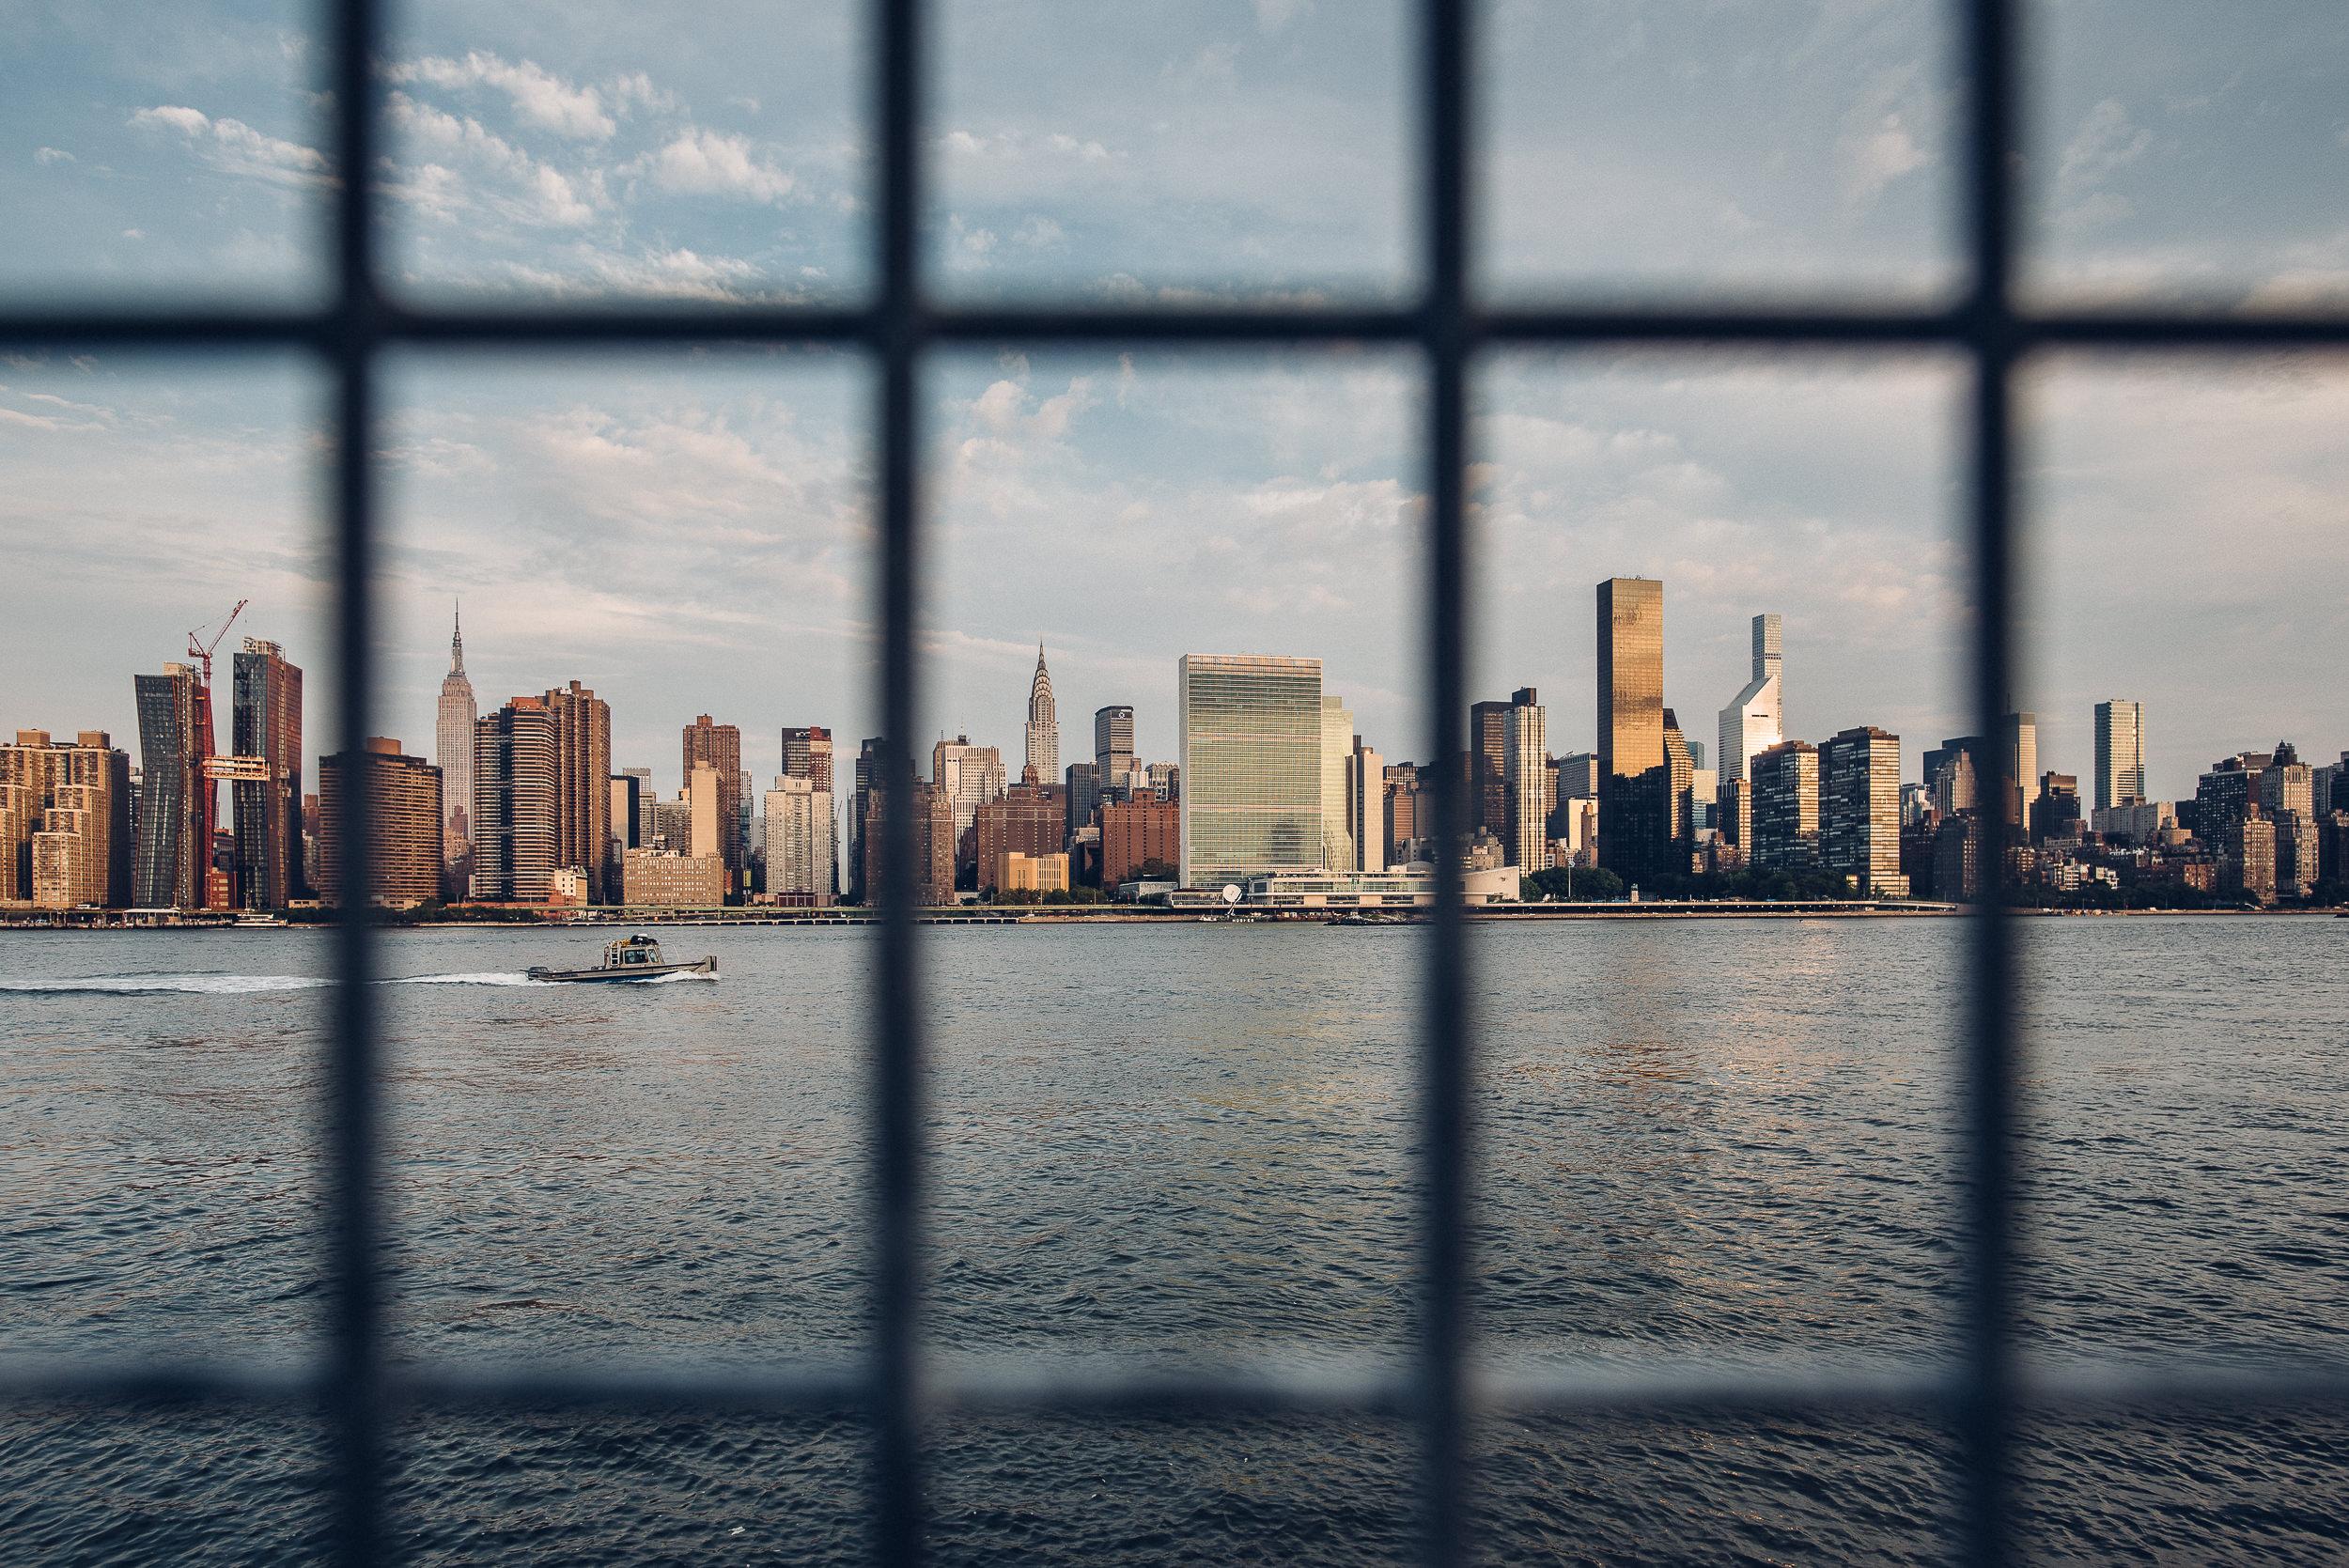 New-York-City-Travel-Photography-012.jpg